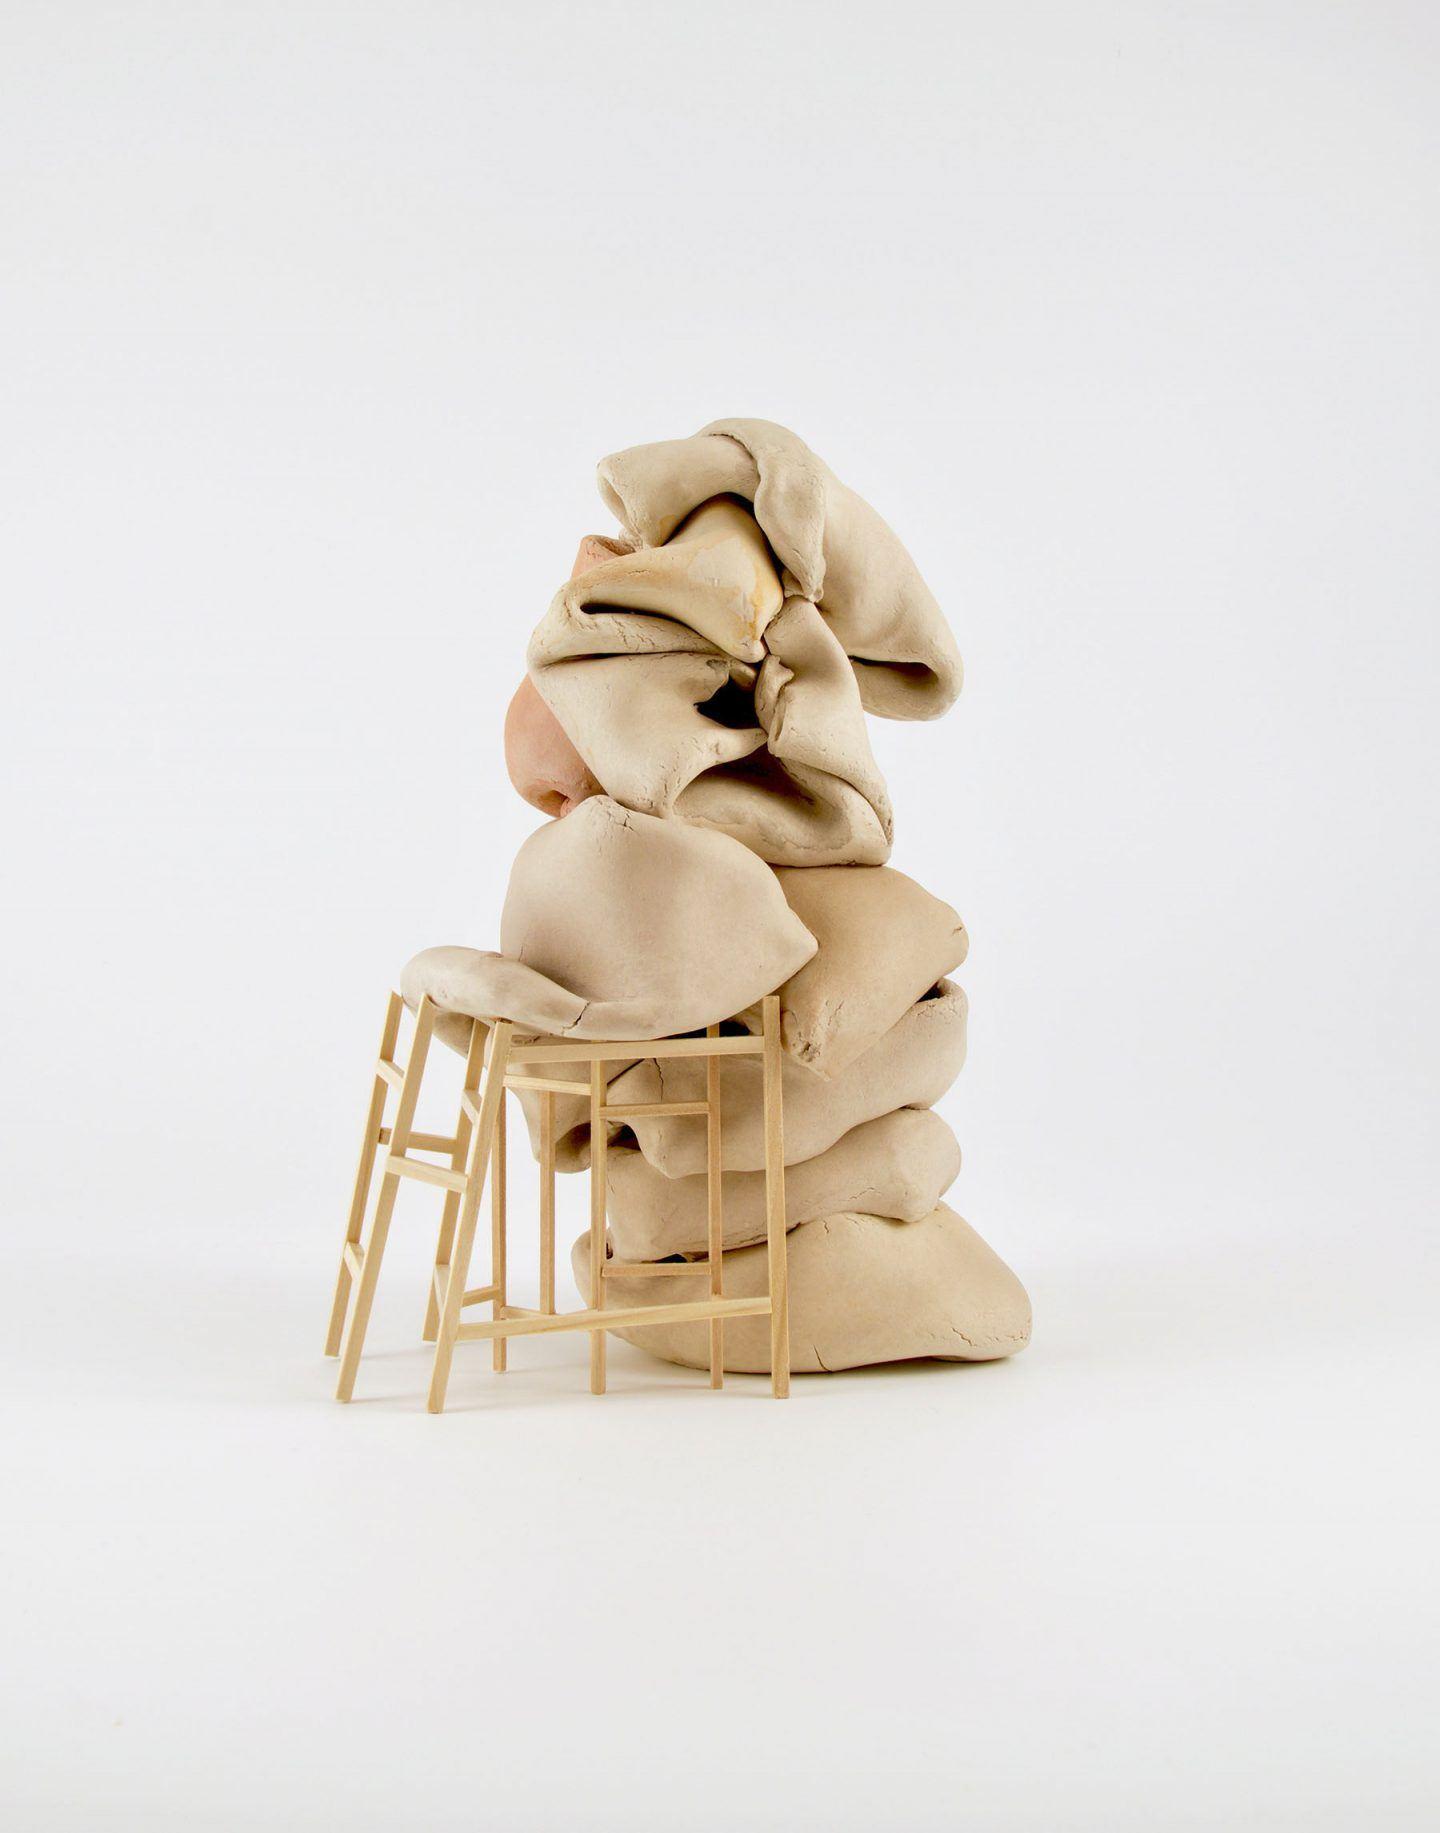 IGNANT-Art-Sara-Allen-Prigodich-23